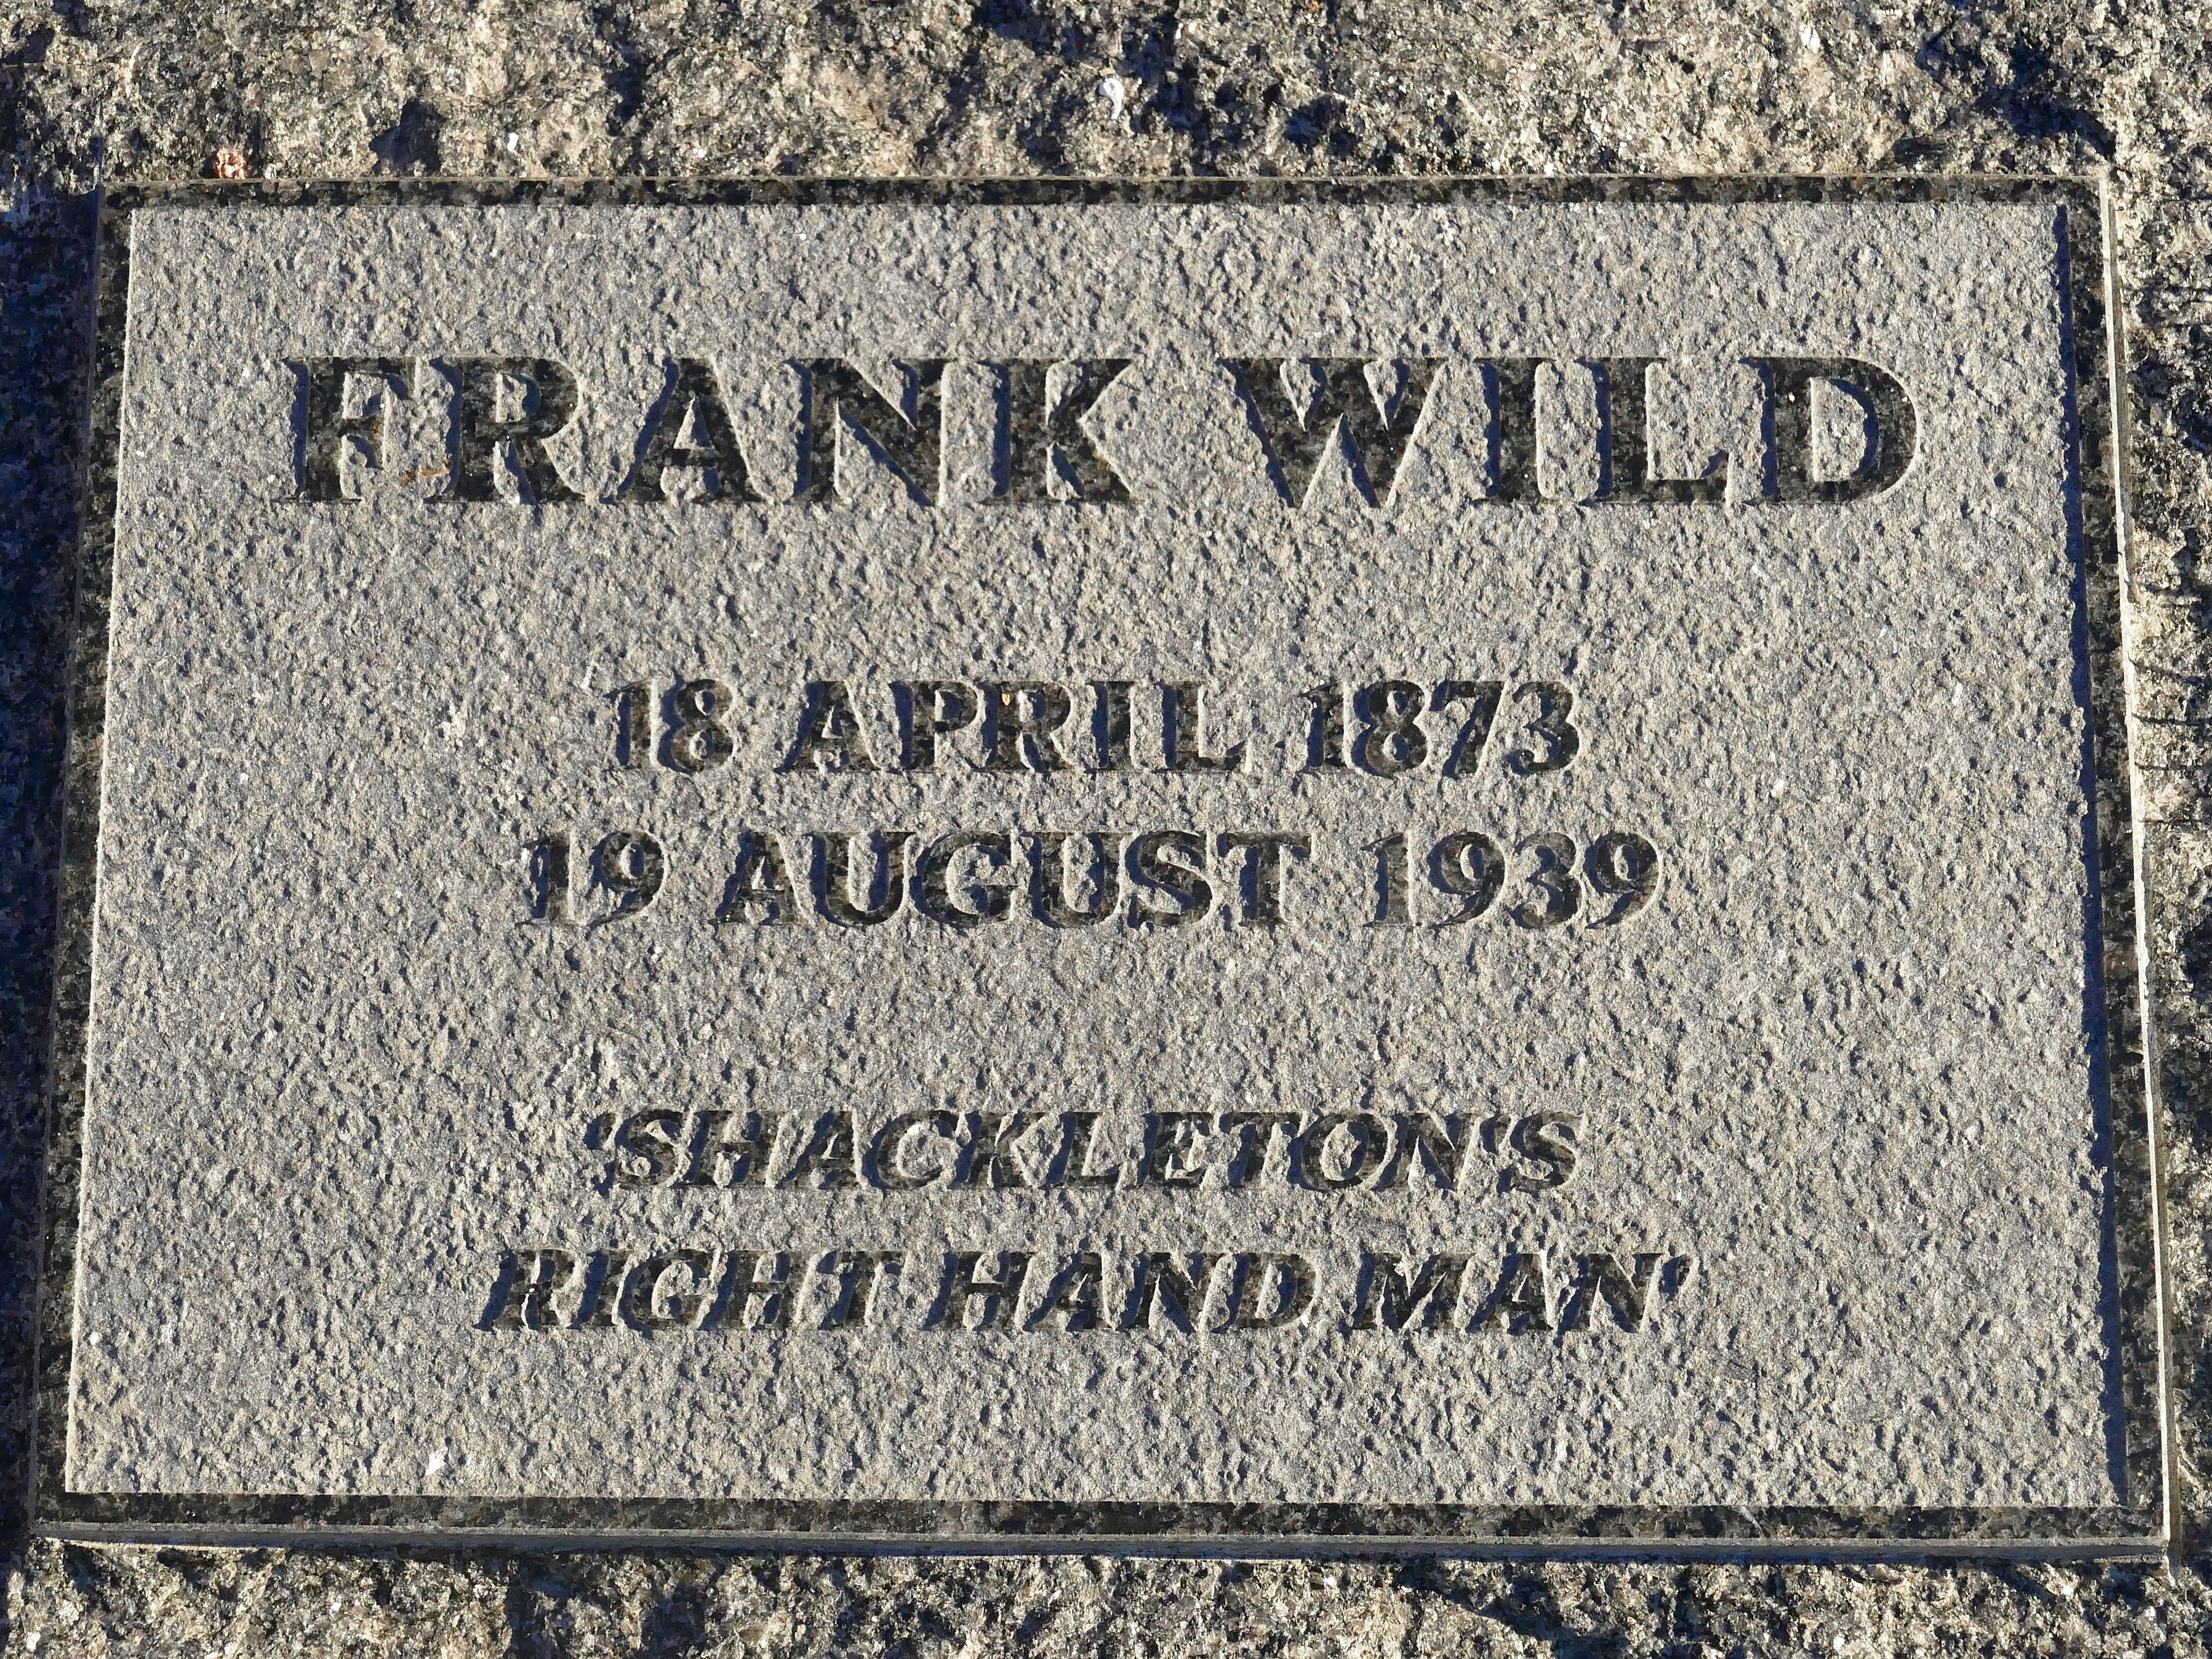 Wild's memorial stone, next to Shackleton at Grytviken